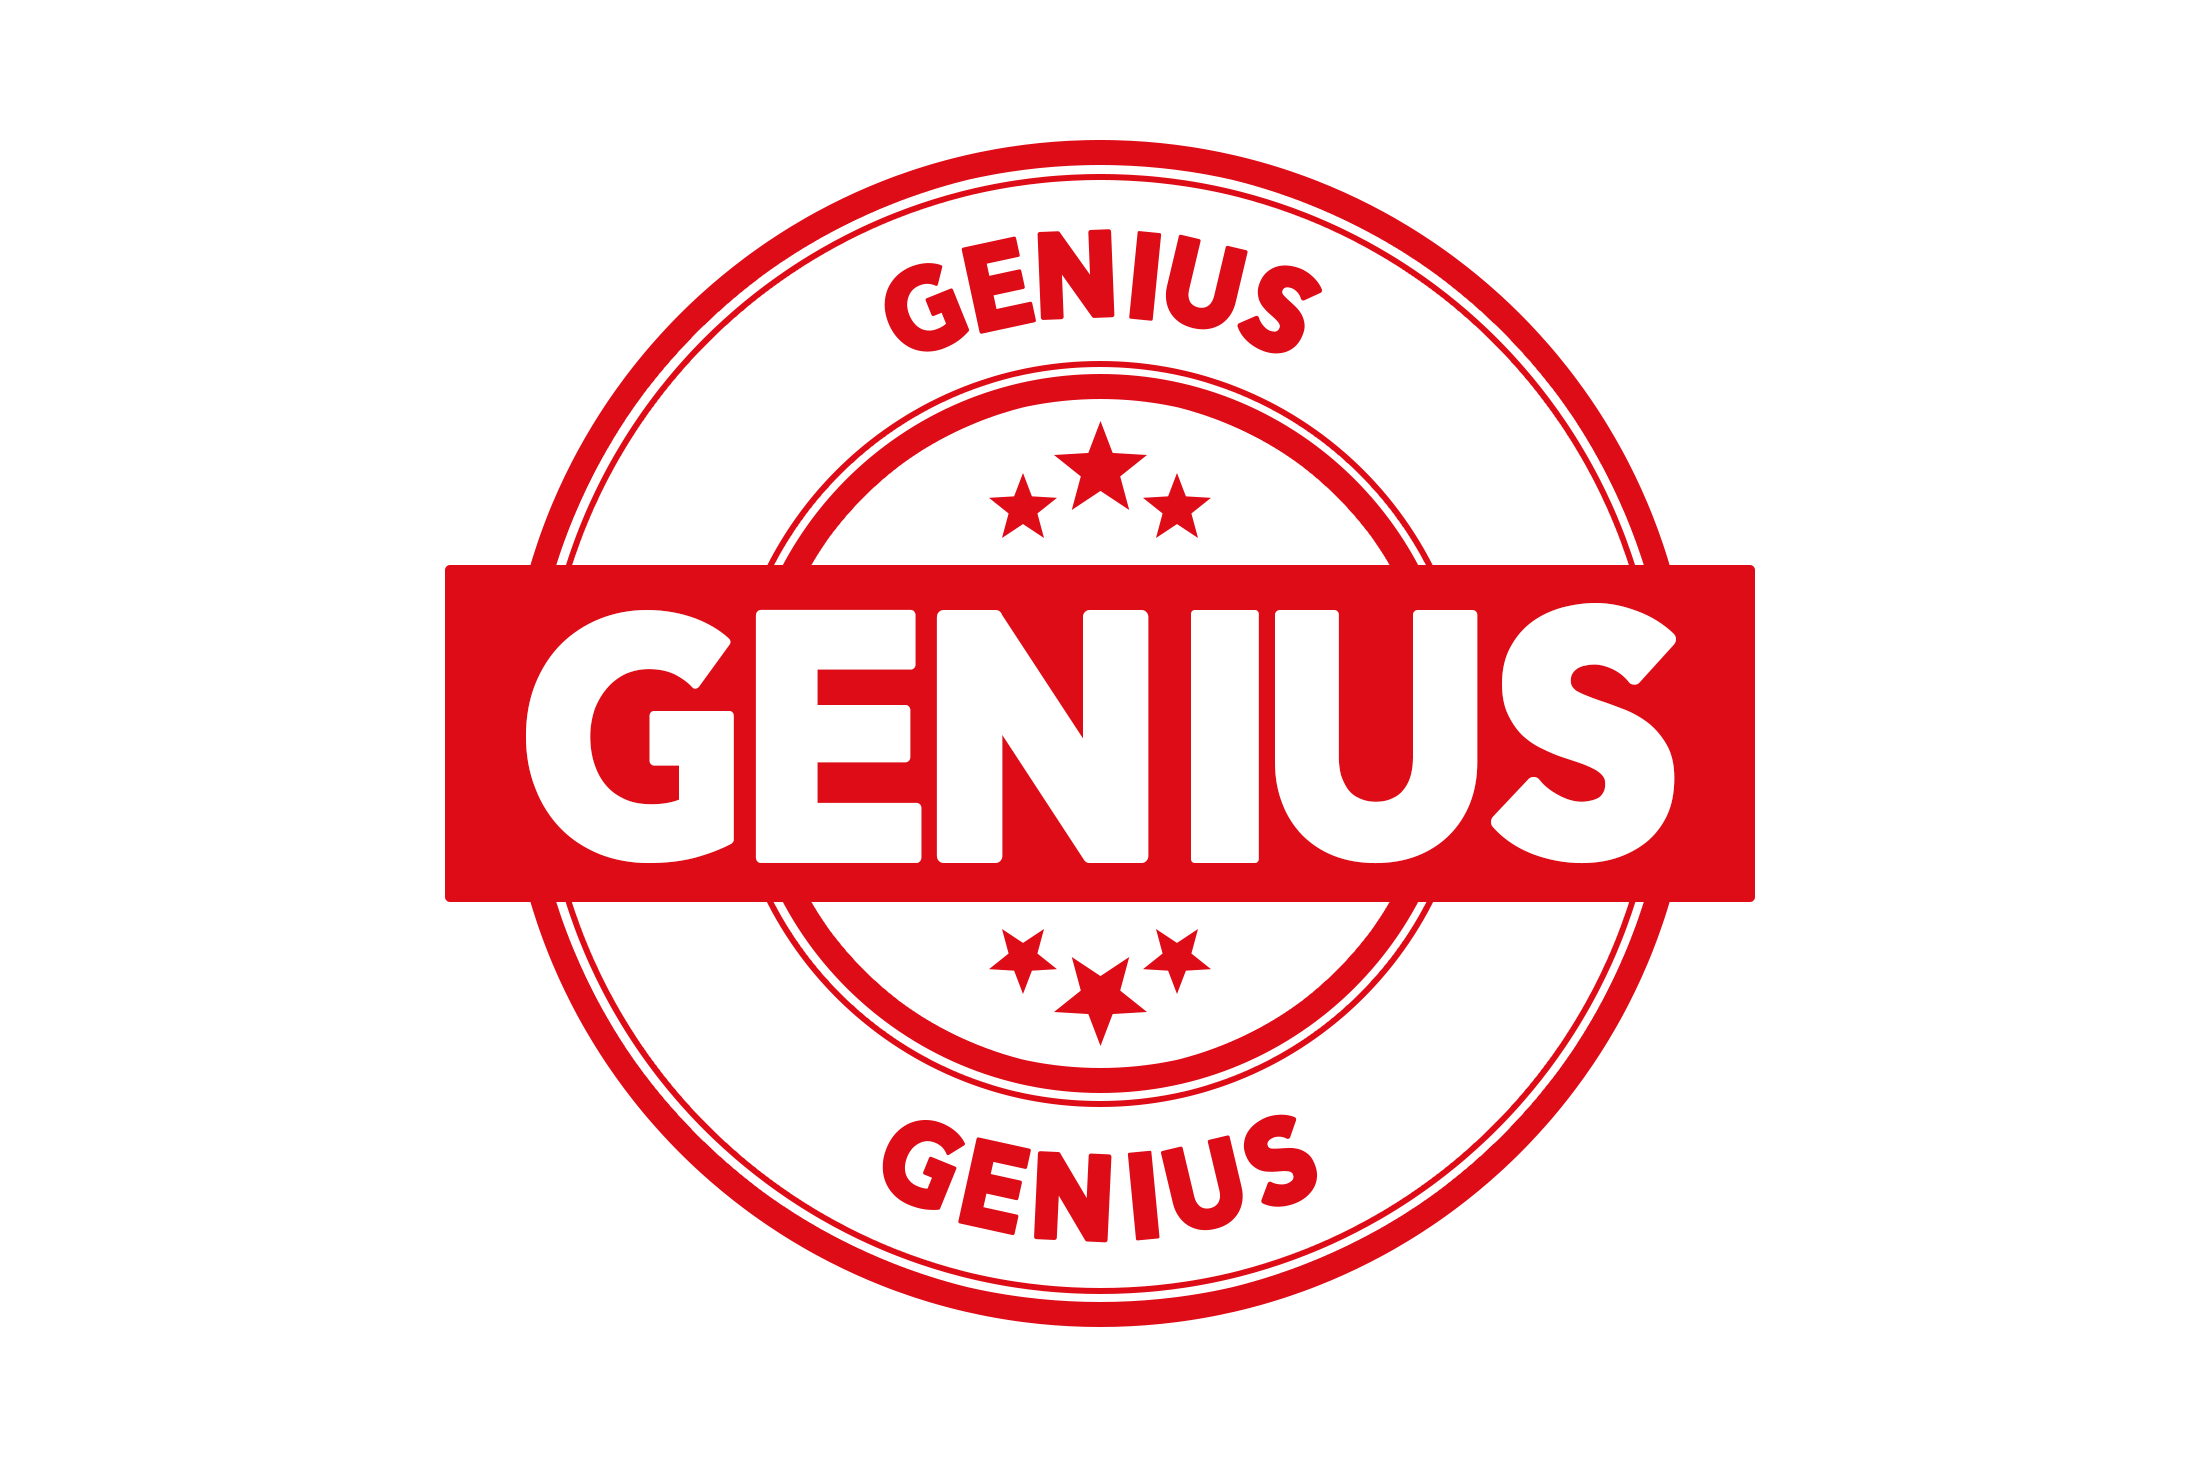 Round genius stamp PSD